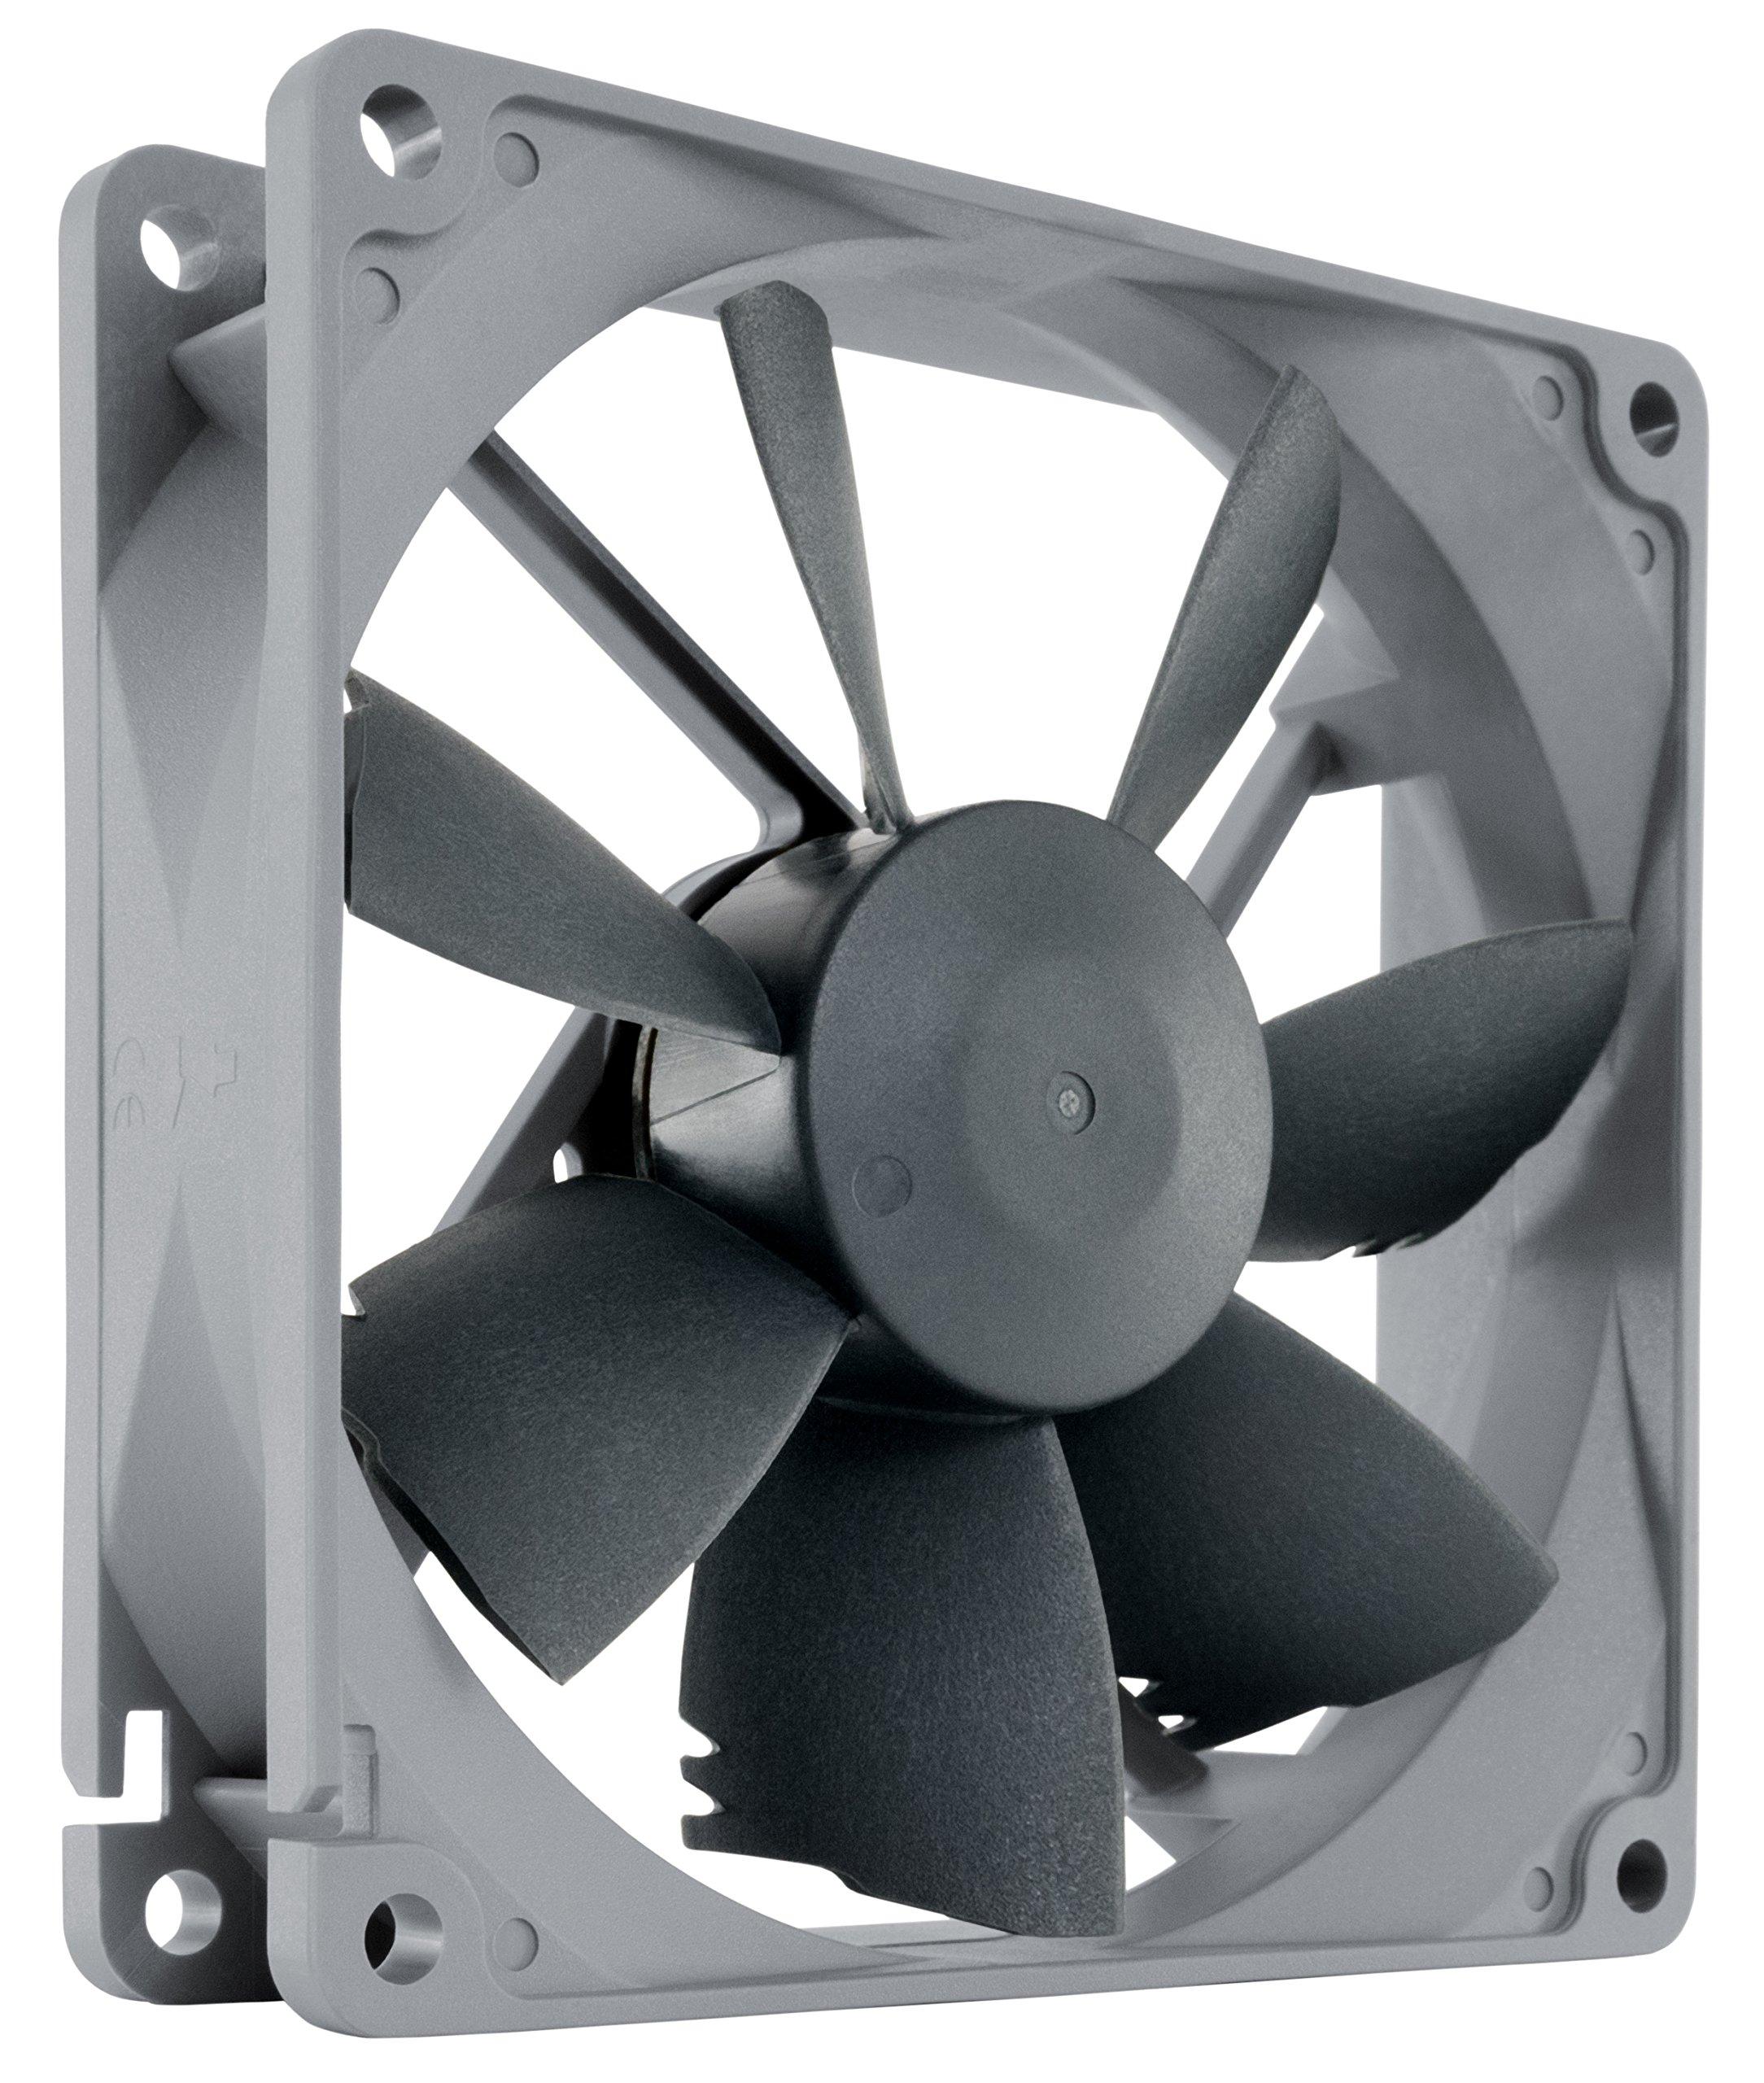 Noctua SSO Bearing Fan Retail Cooling NF-B9 redux-1600 PWM